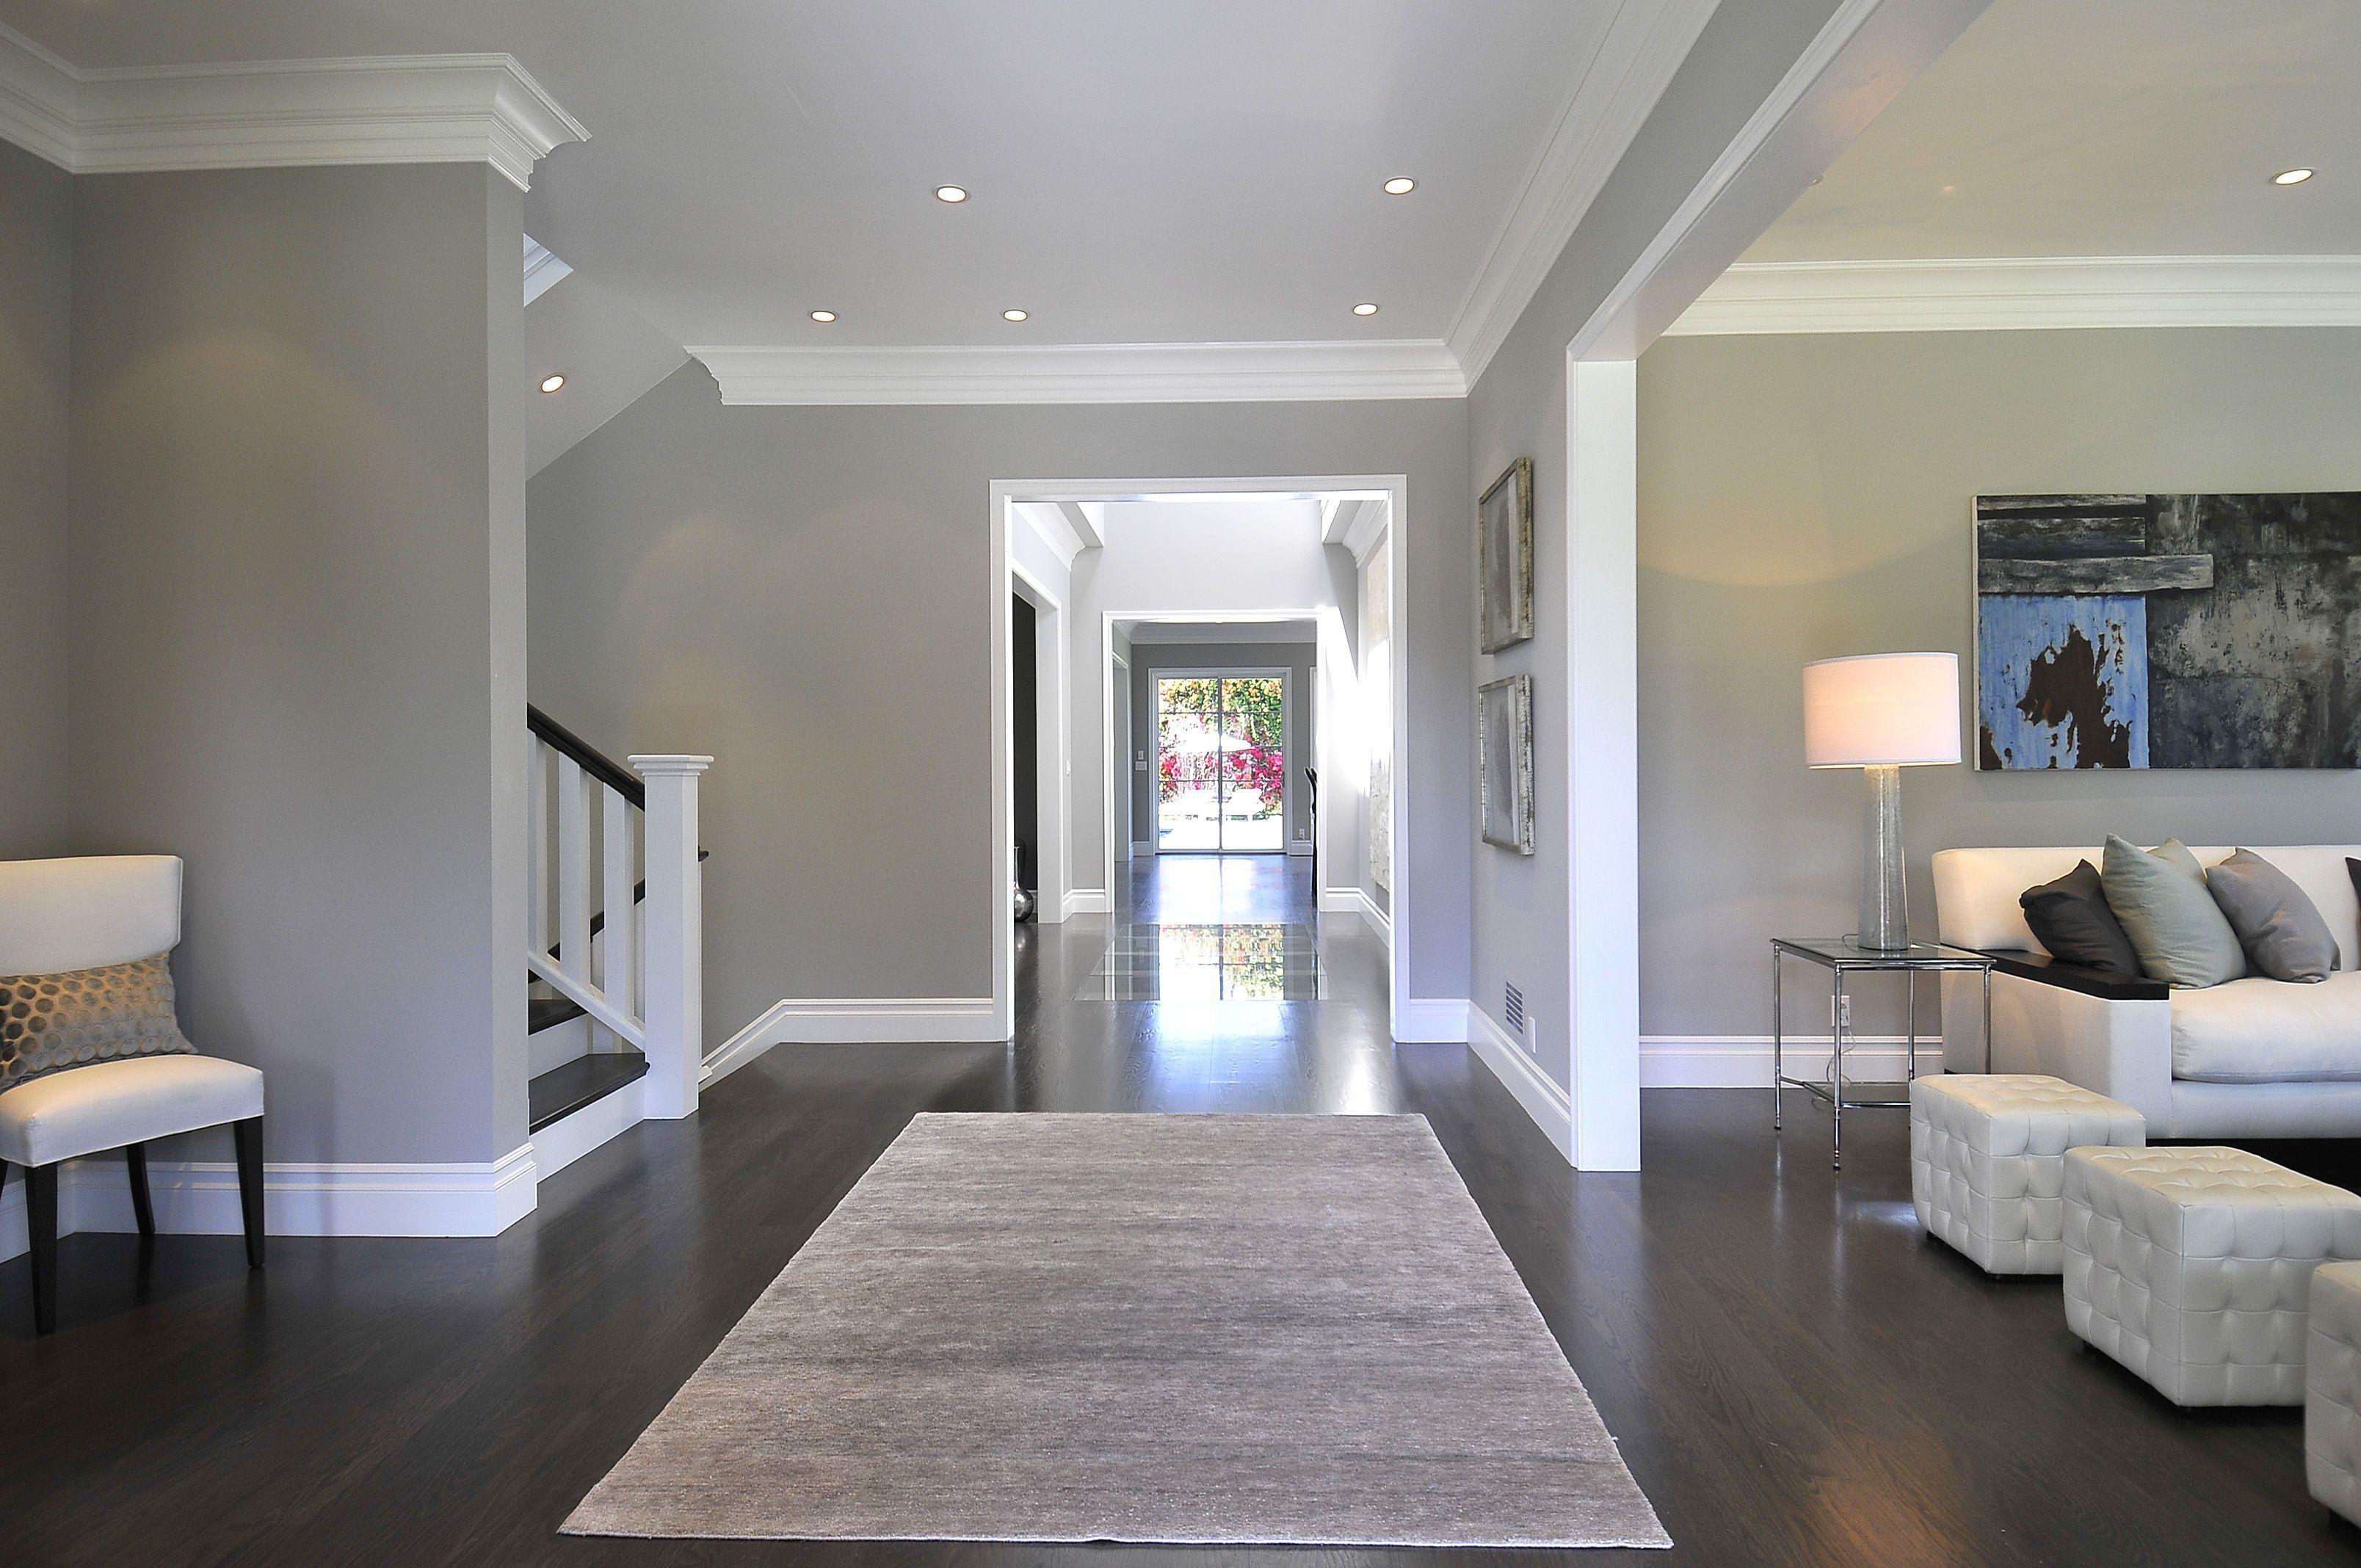 34 Luxury Greige Living Room Illustration Grey Walls House